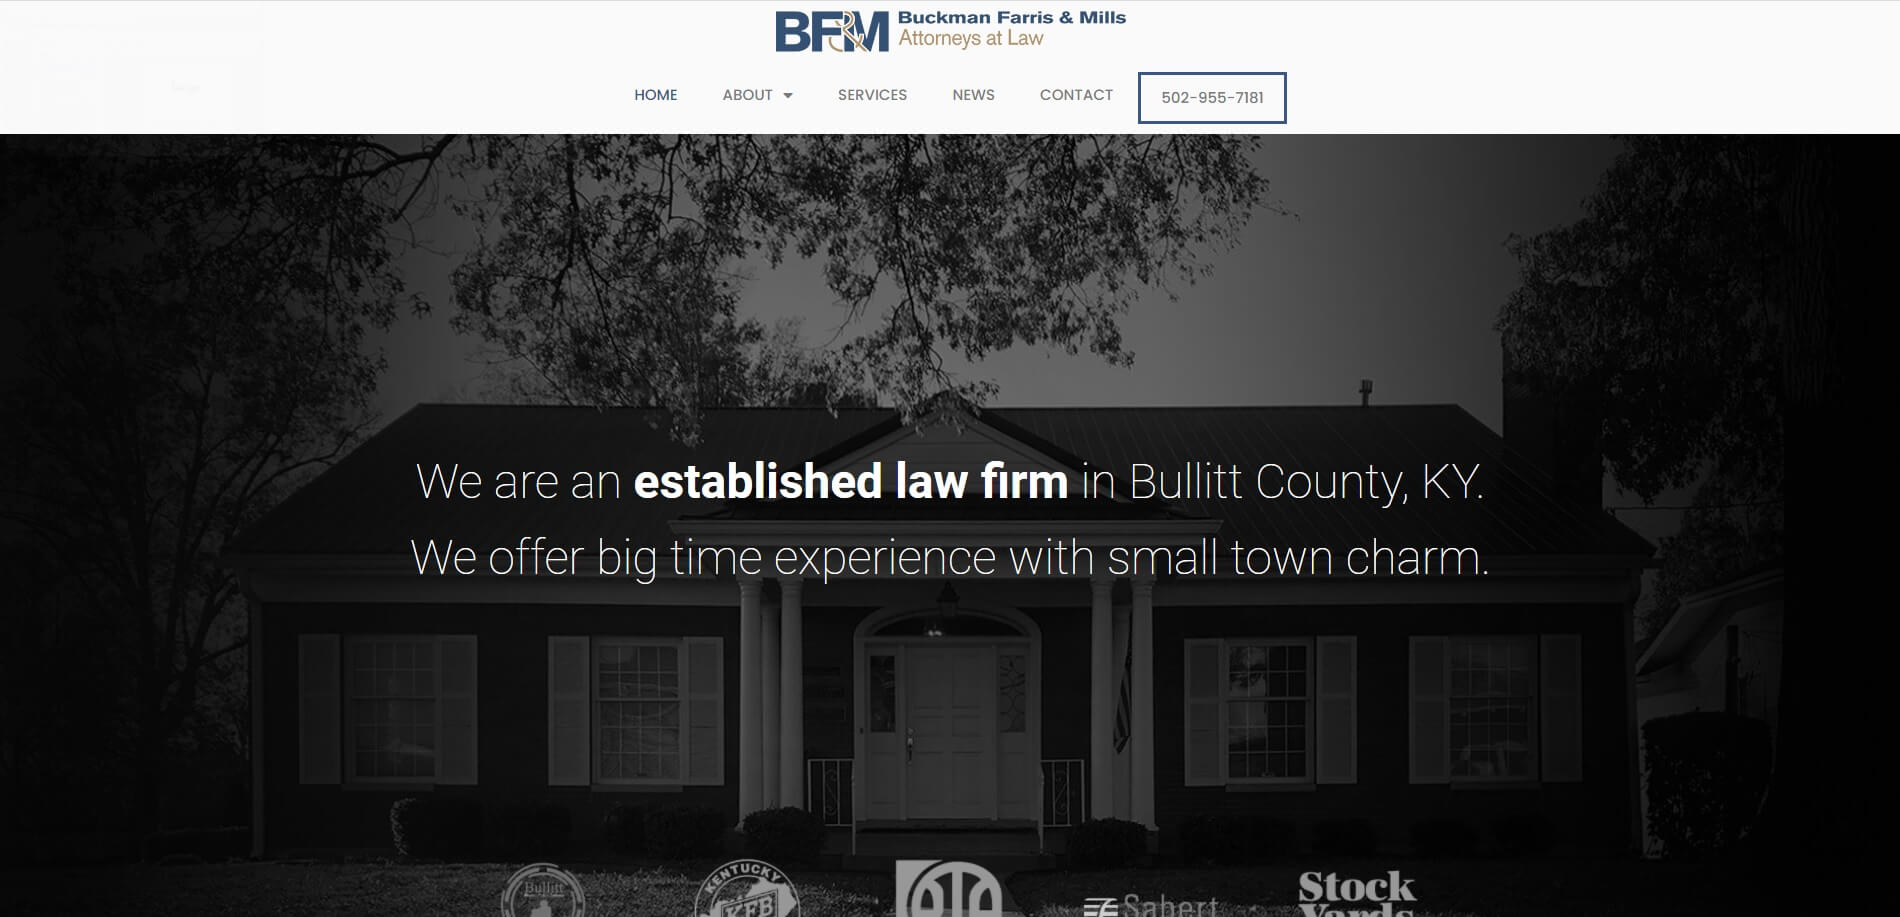 buckmanfarrislaw.com Homepage